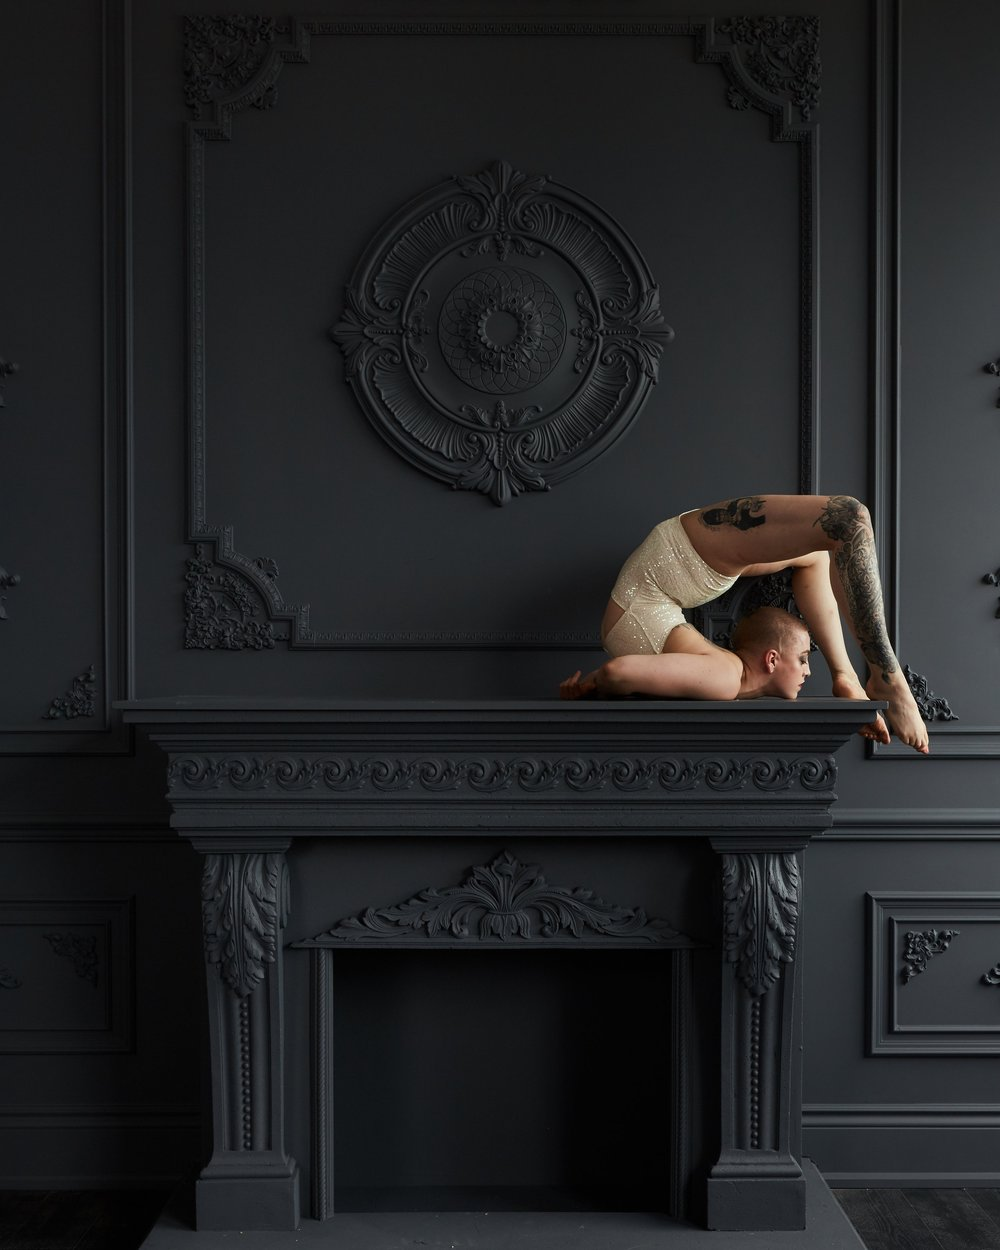 ess+contortion+mnt+room.jpg